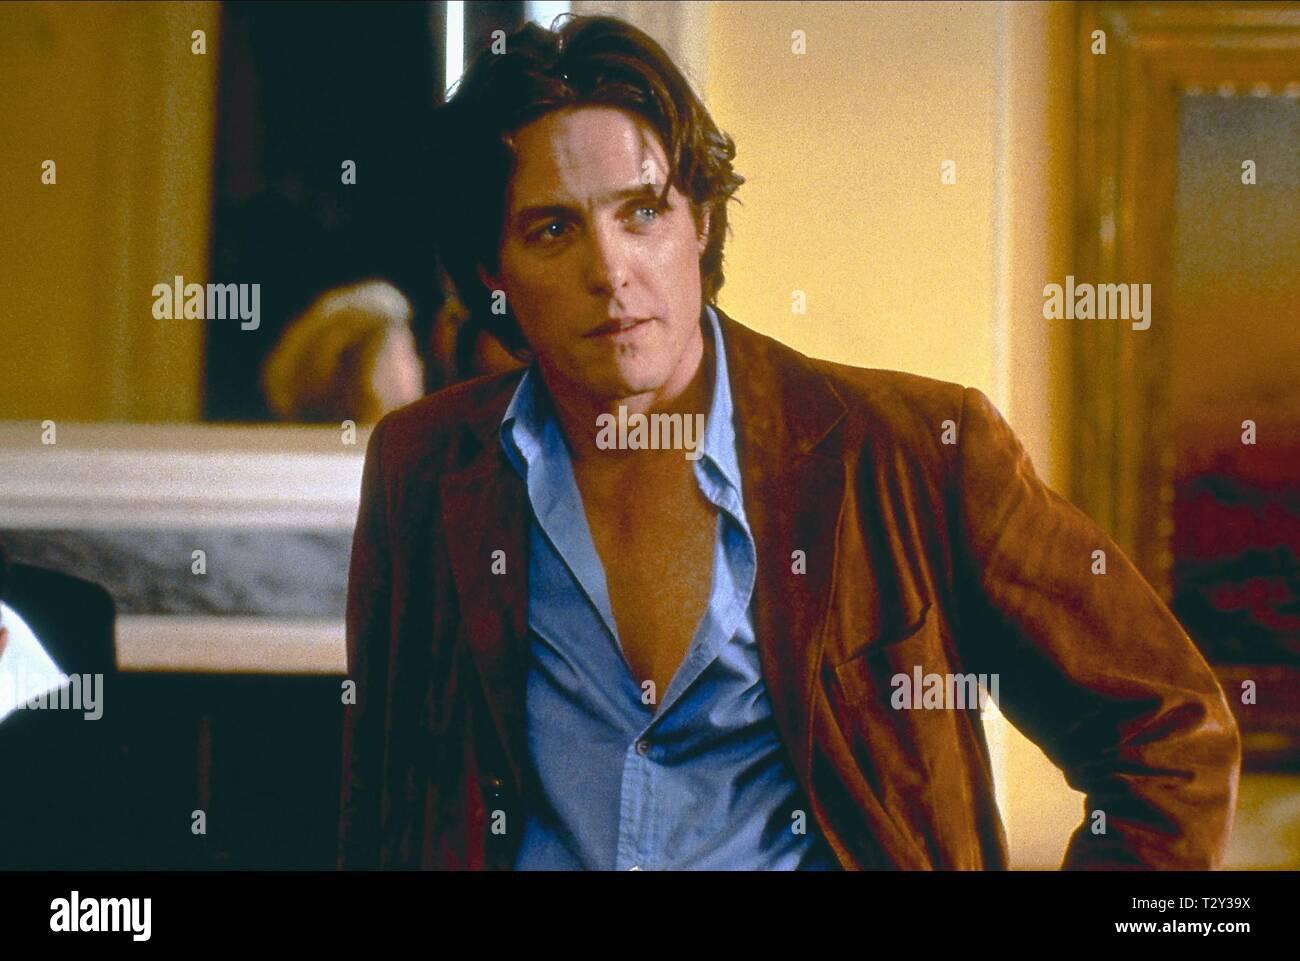 Hugh Grant Bridget Jones S Diary 2001 Stock Photo Alamy